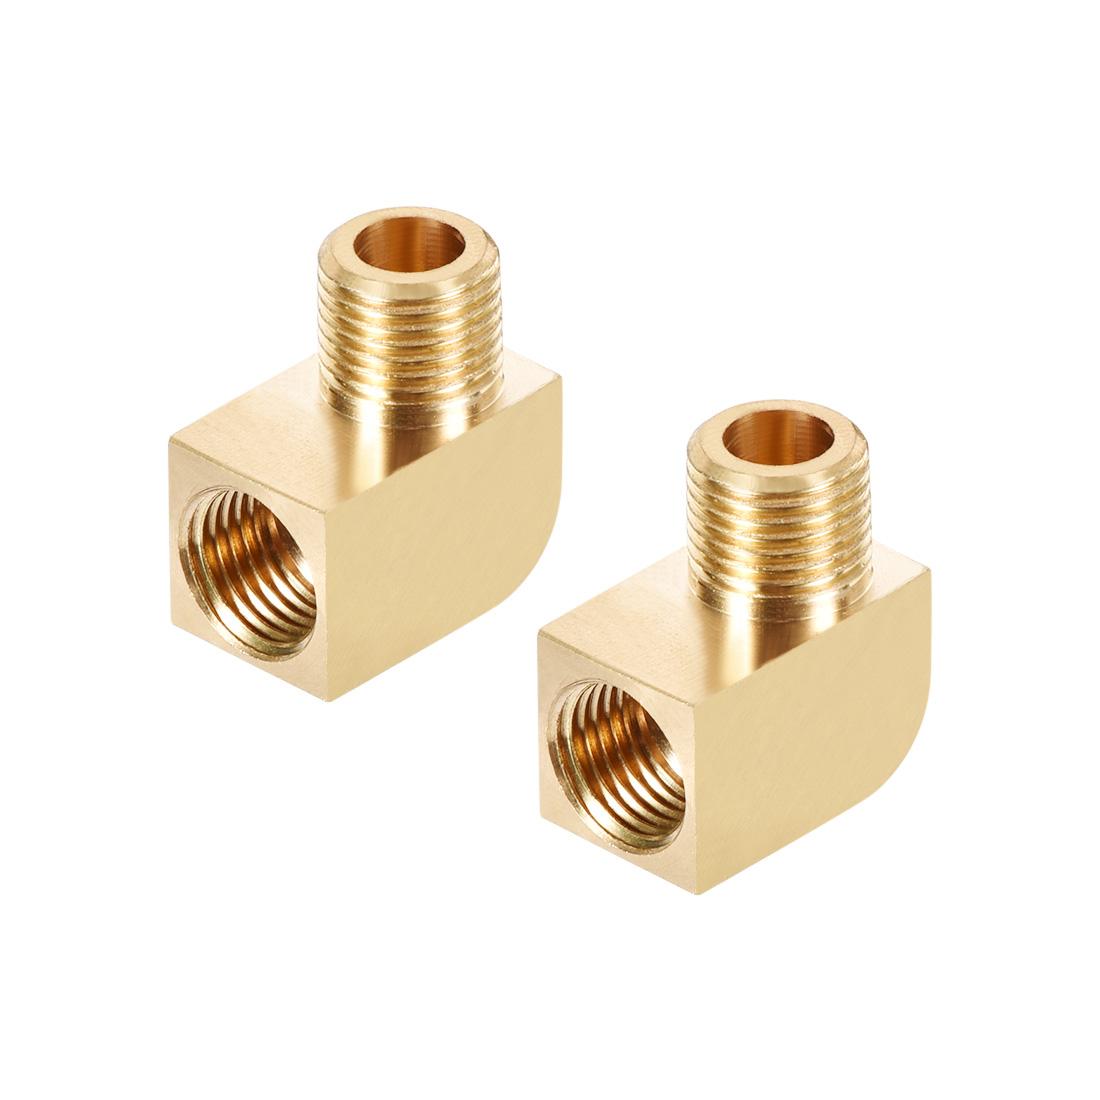 Brass Pipe Fitting 90 Degree Barstock Street Elbow M10 MalexG1/8 Female 2pcs